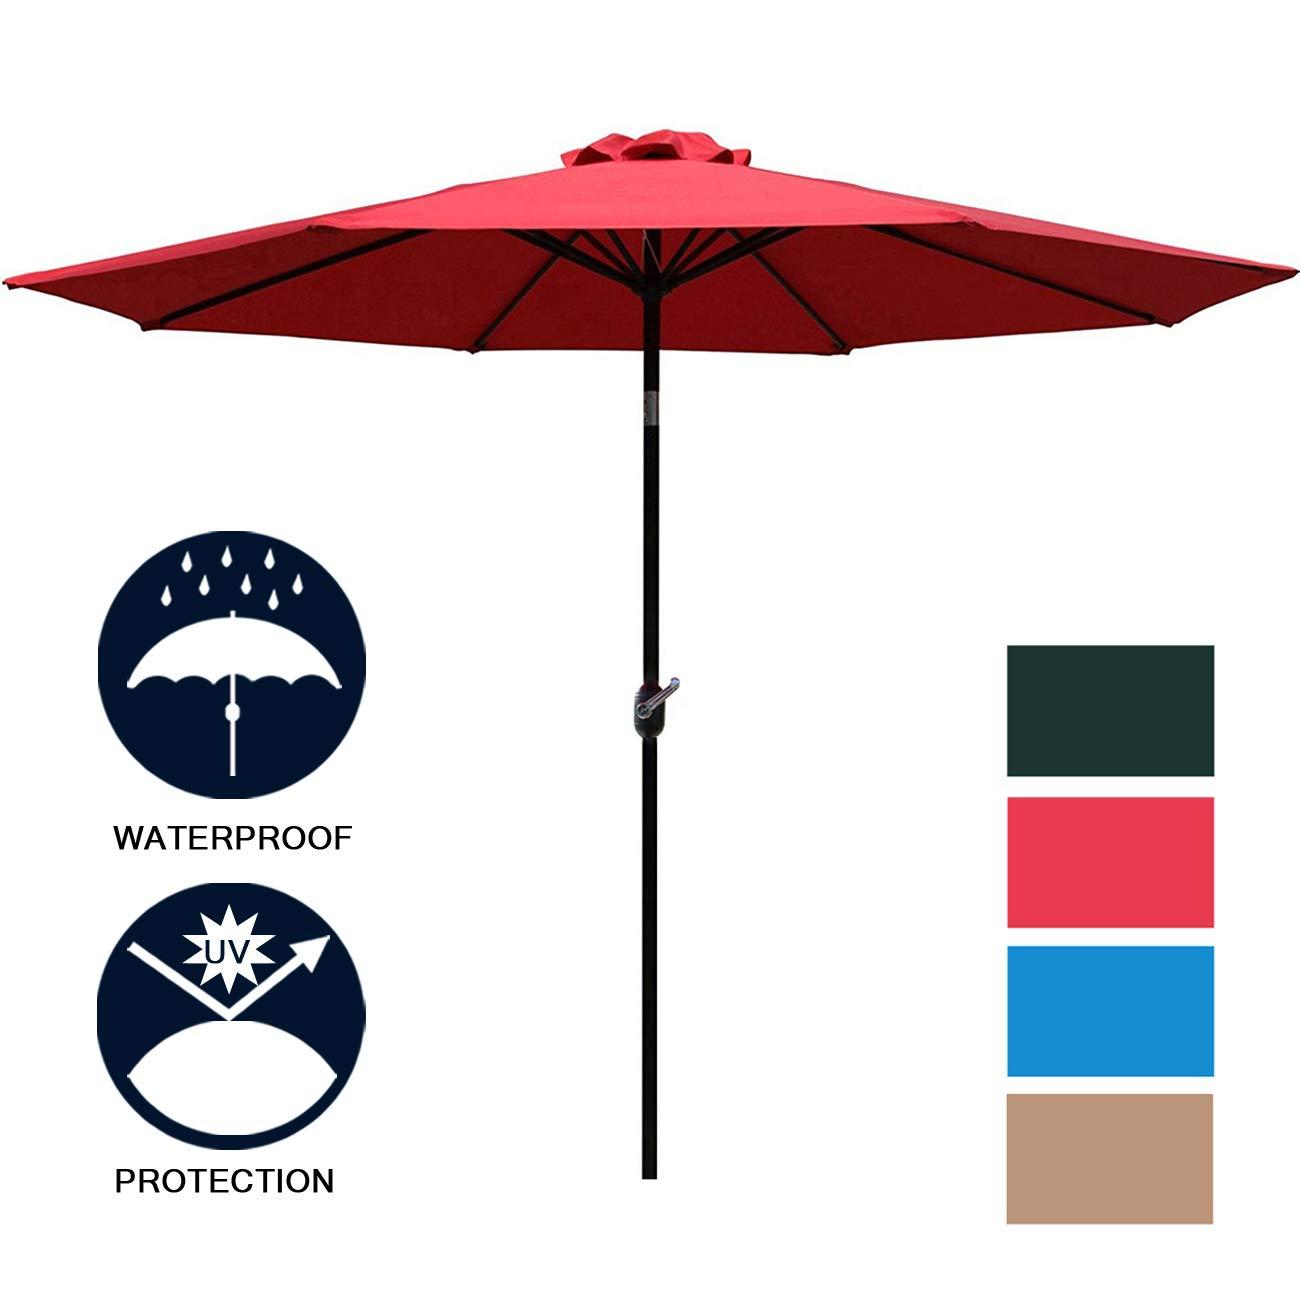 9 Patio Table Umbrella Outdoor Fabric Aluminum Sun Shade Waterproof